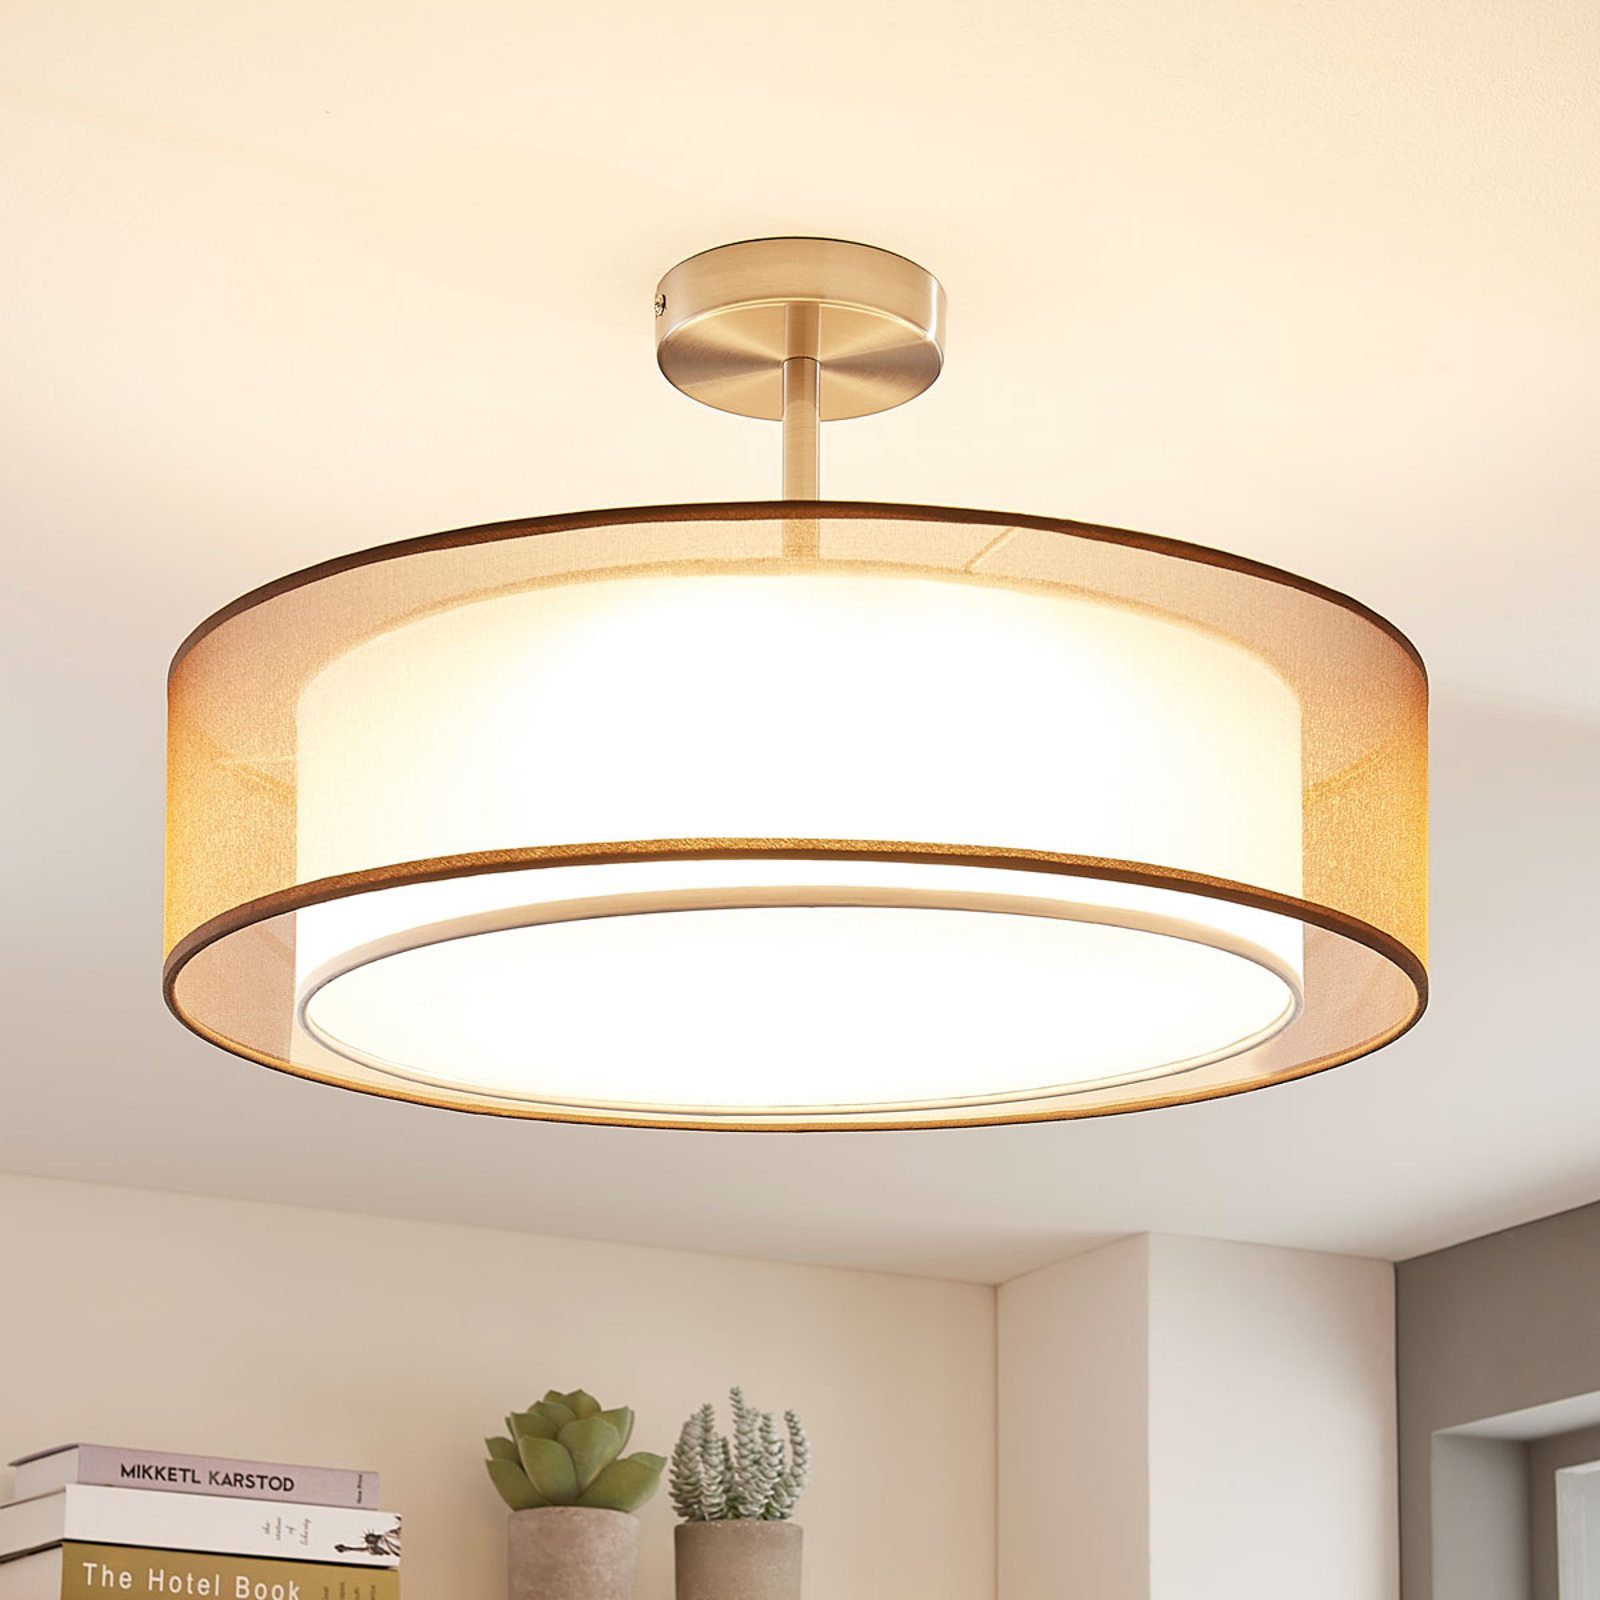 LED-taklampa Pikka, dimbar i 3 steg, brun